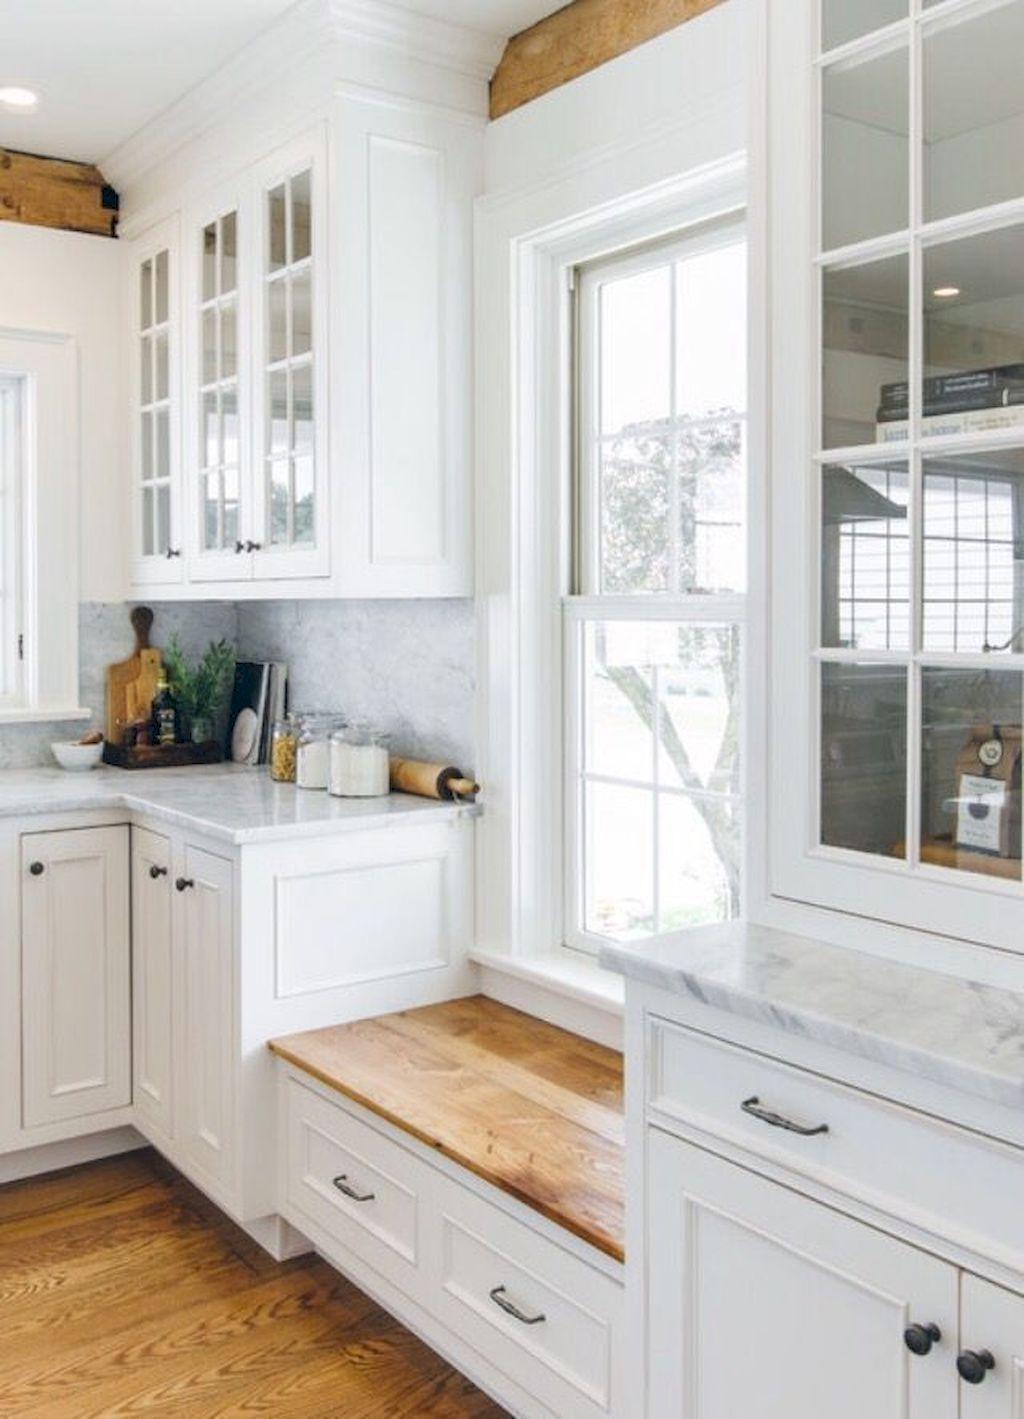 farmhouse kitchen cabinets decorating ideas on a budget 73 white farmhouse kitchens window on farmhouse kitchen window id=54003